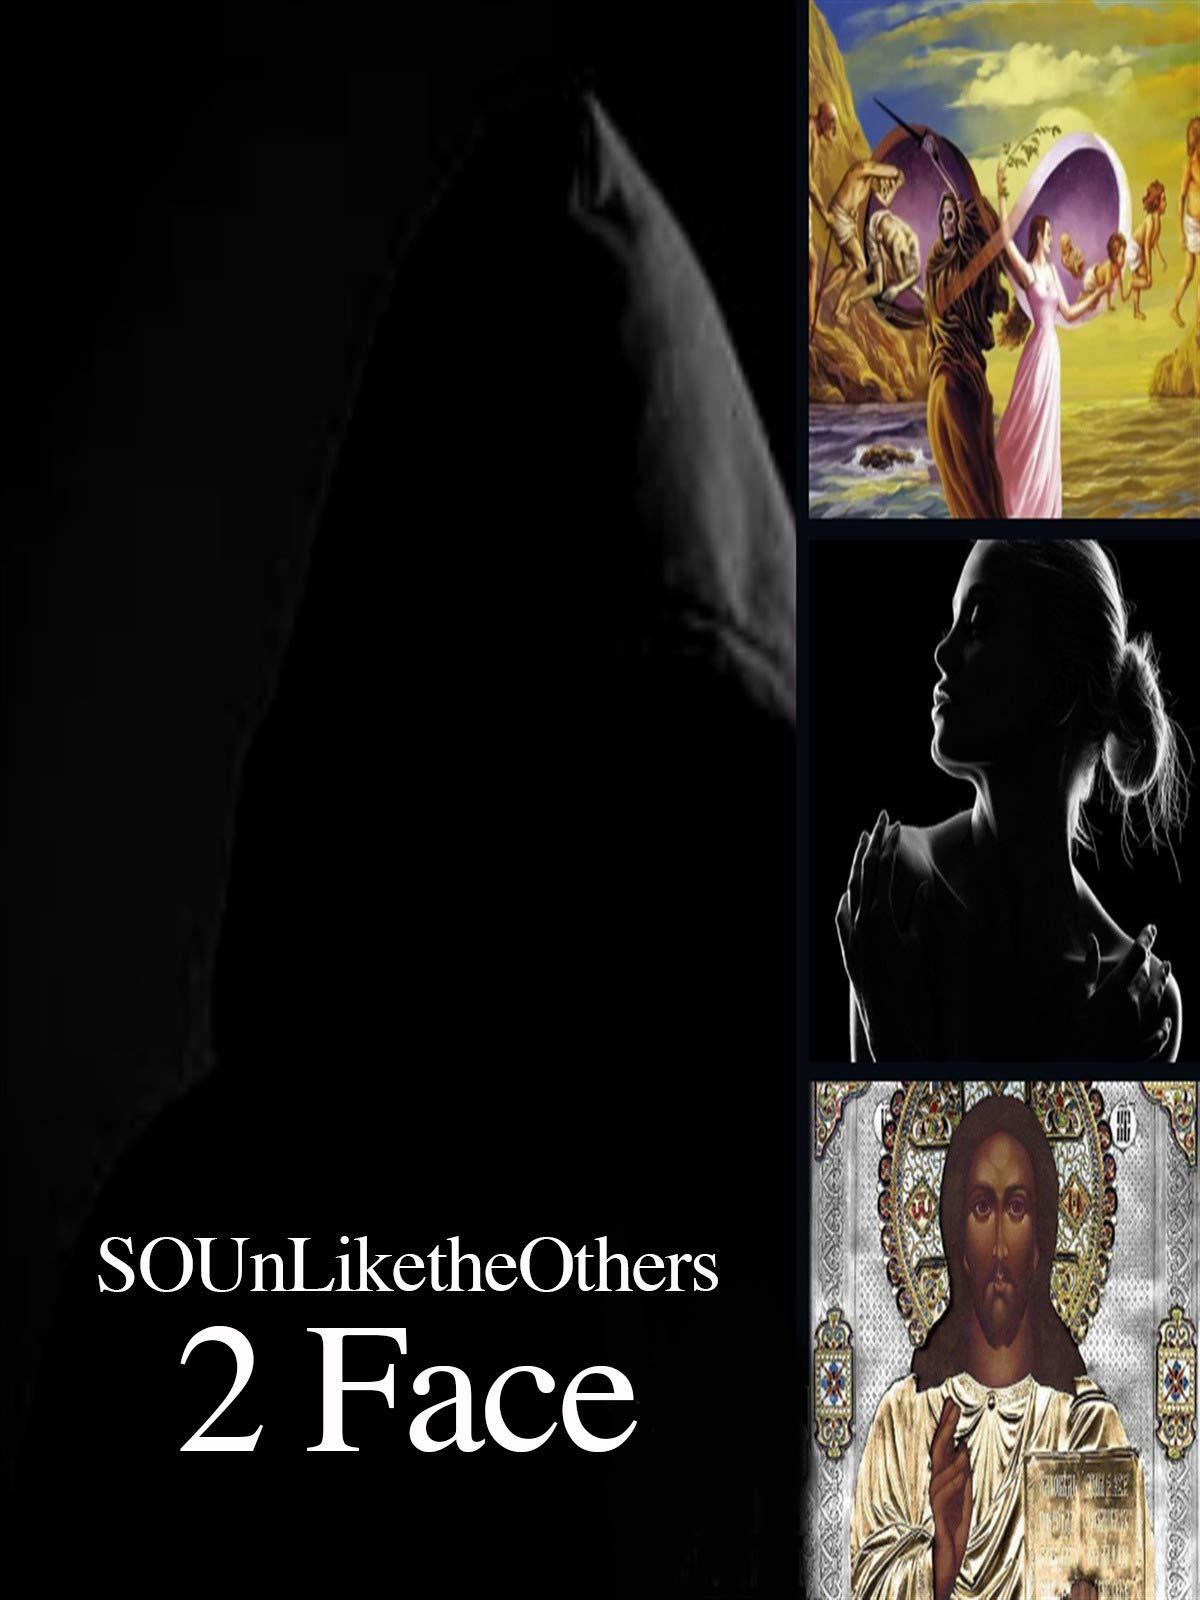 SOUnLiketheOthers - 2 Face on Amazon Prime Instant Video UK